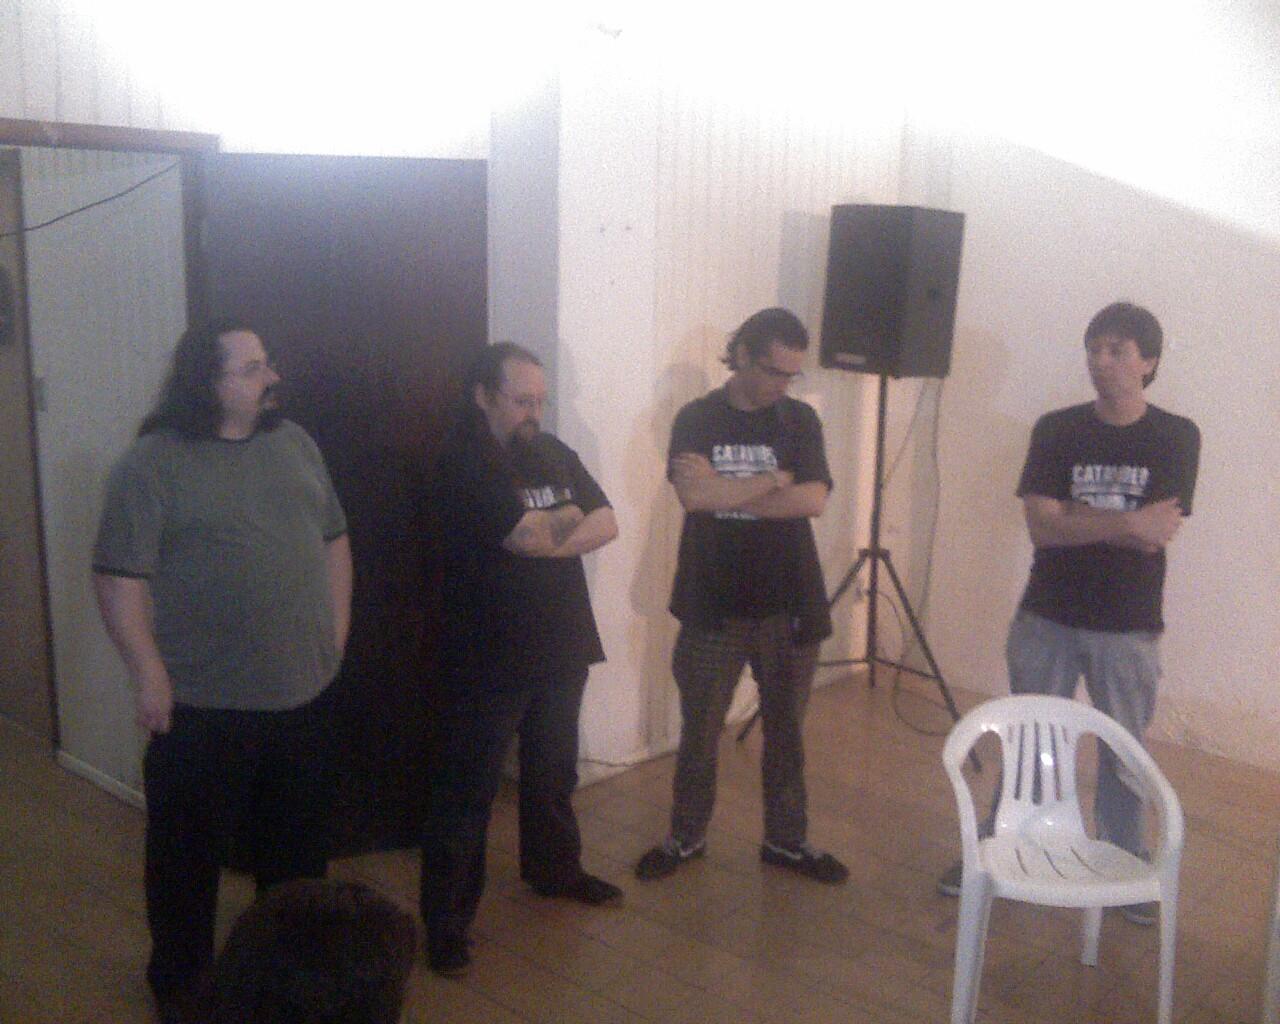 Bate-papo @catavideo com Petter Baiestorf, Gurcius Gewdner e Saulo Popov!